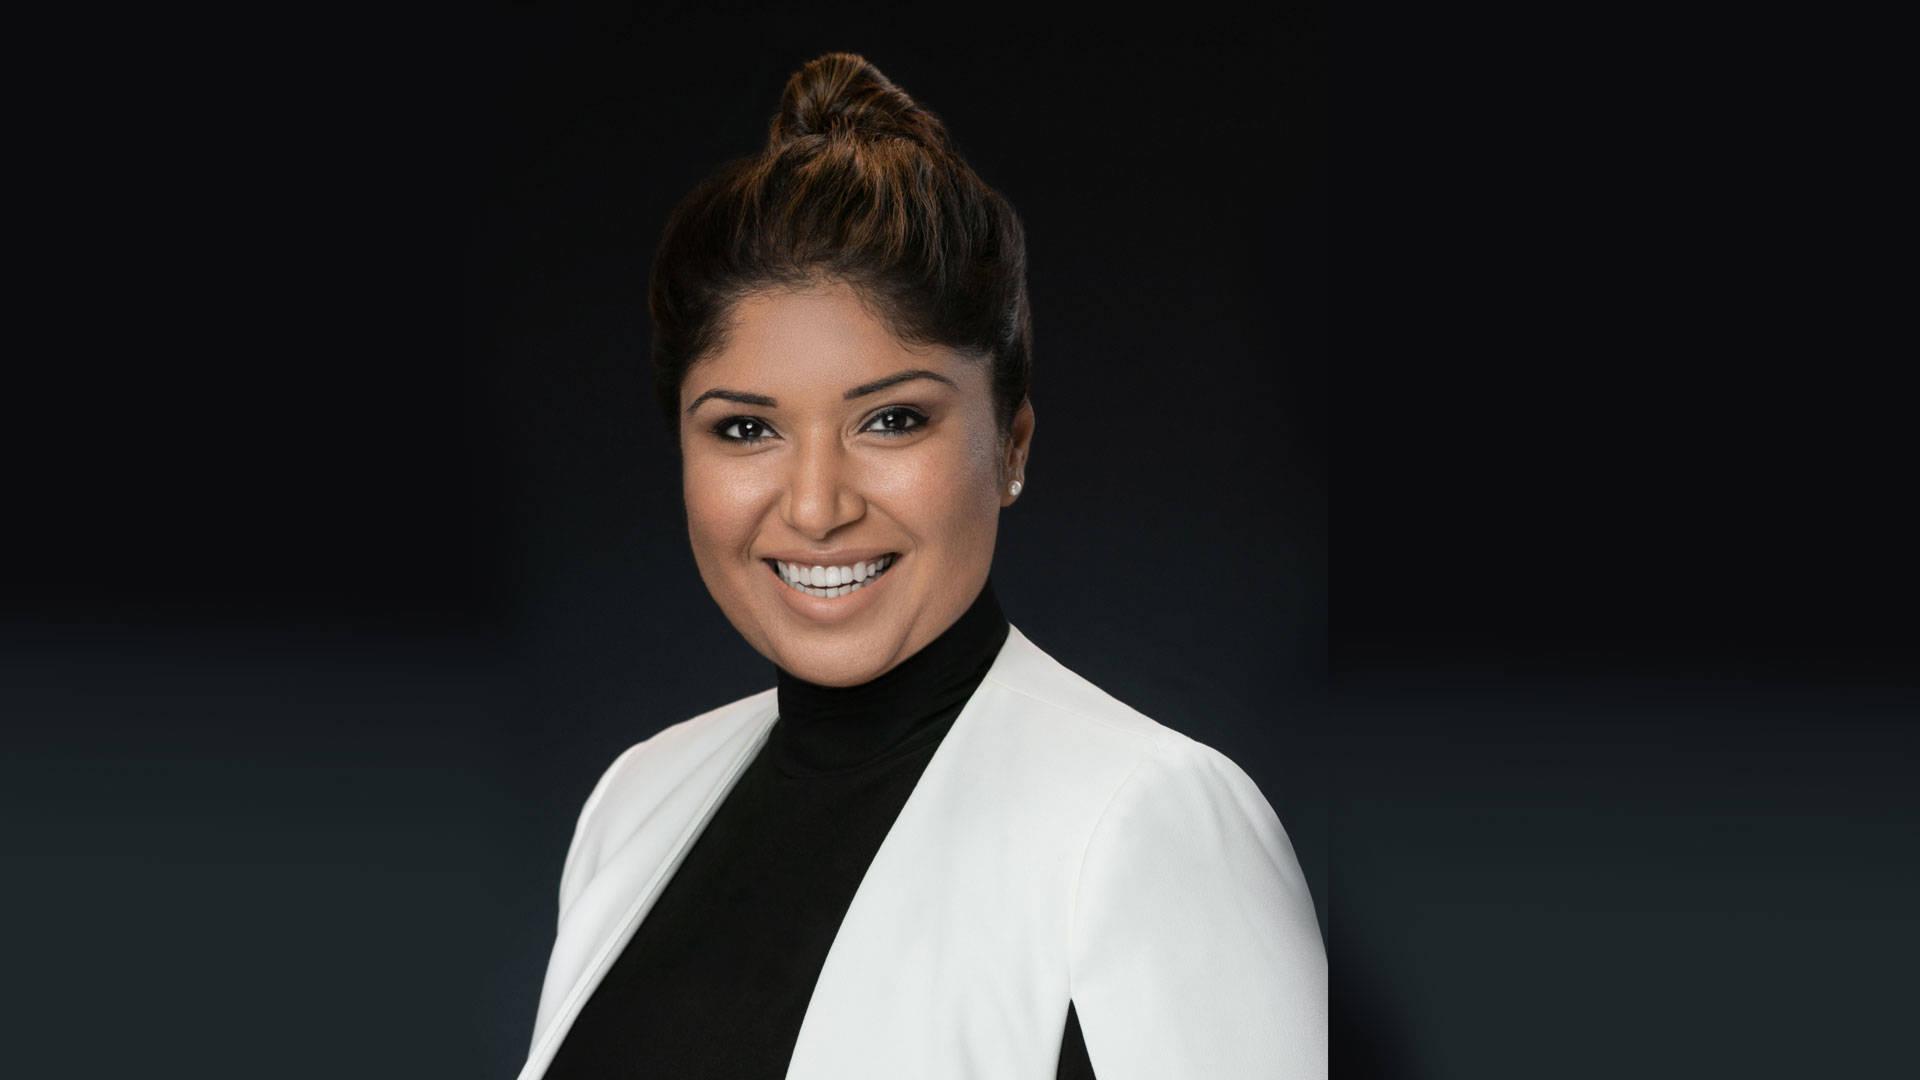 Priya S. Nayar, Direktorin des Nordamerika-Büros der Hochschule Fresenius